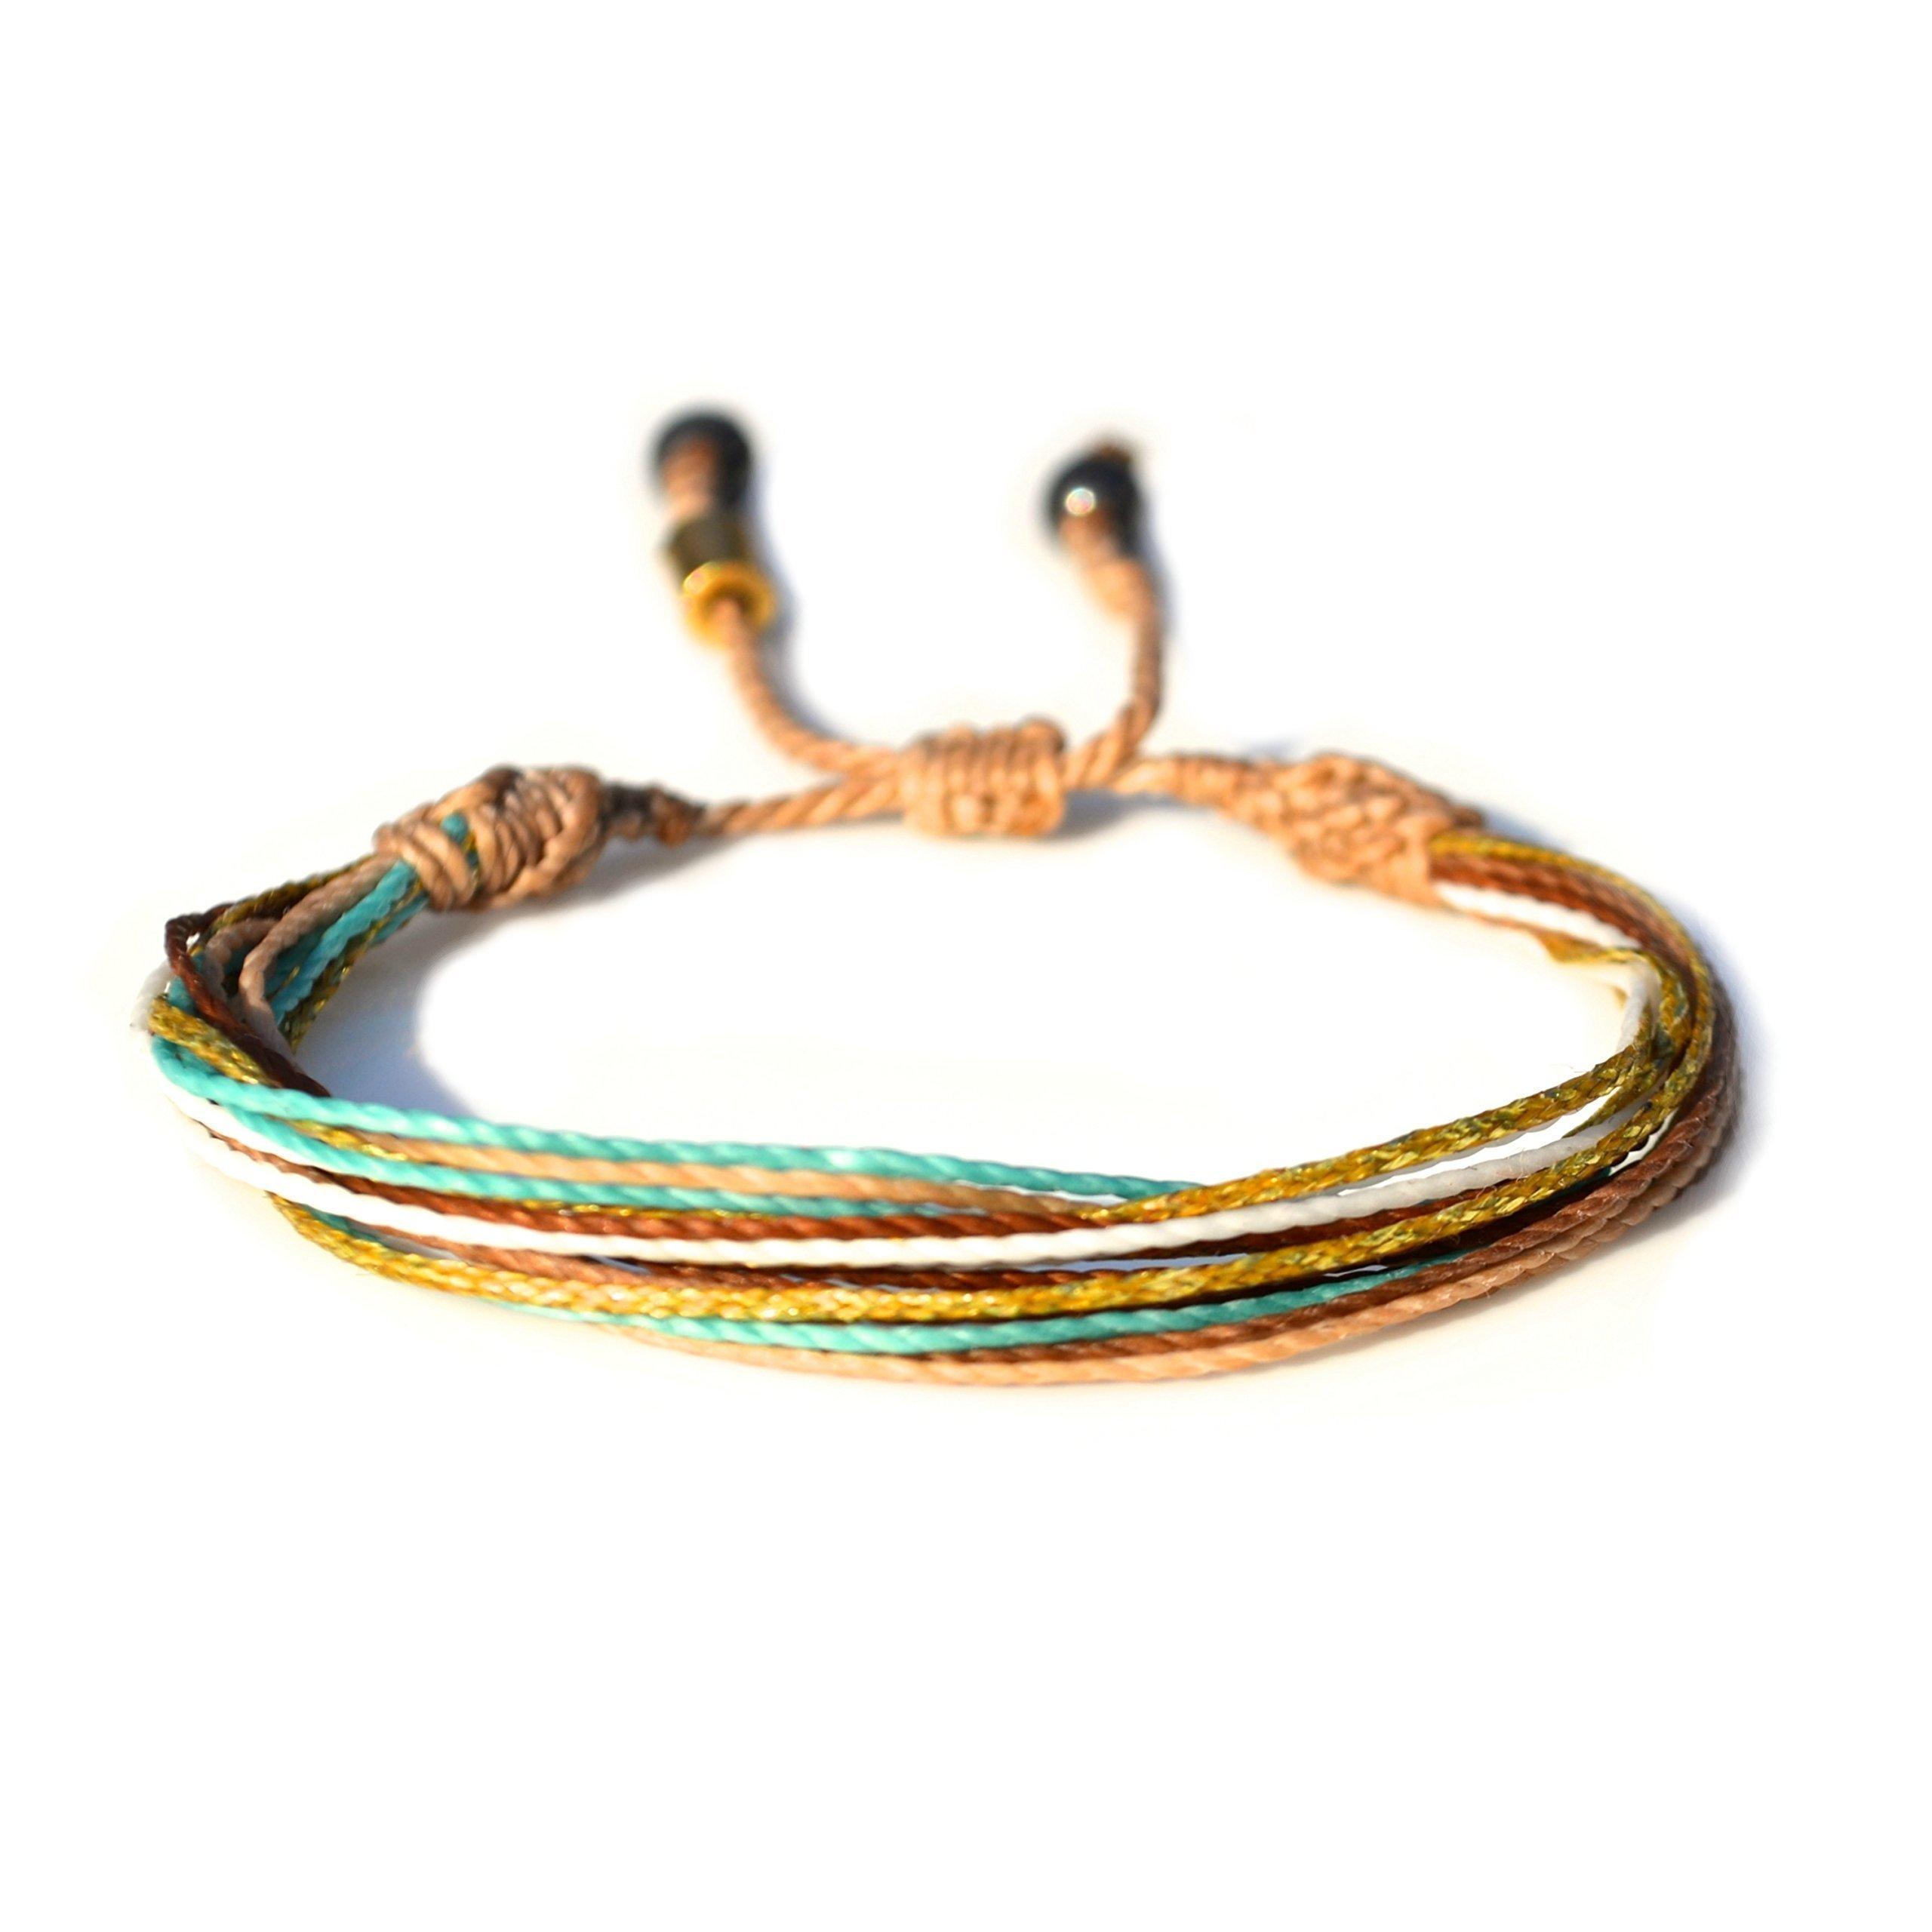 Surfer String Bracelet with Hematite Stones in Tan, Metallic Gold, Aqua, White, and Rust: Handmade Unisex Rope Friendship Beach Adjustable Surf Bracelet for 6-7'' Wrist by Rumi Sumaq